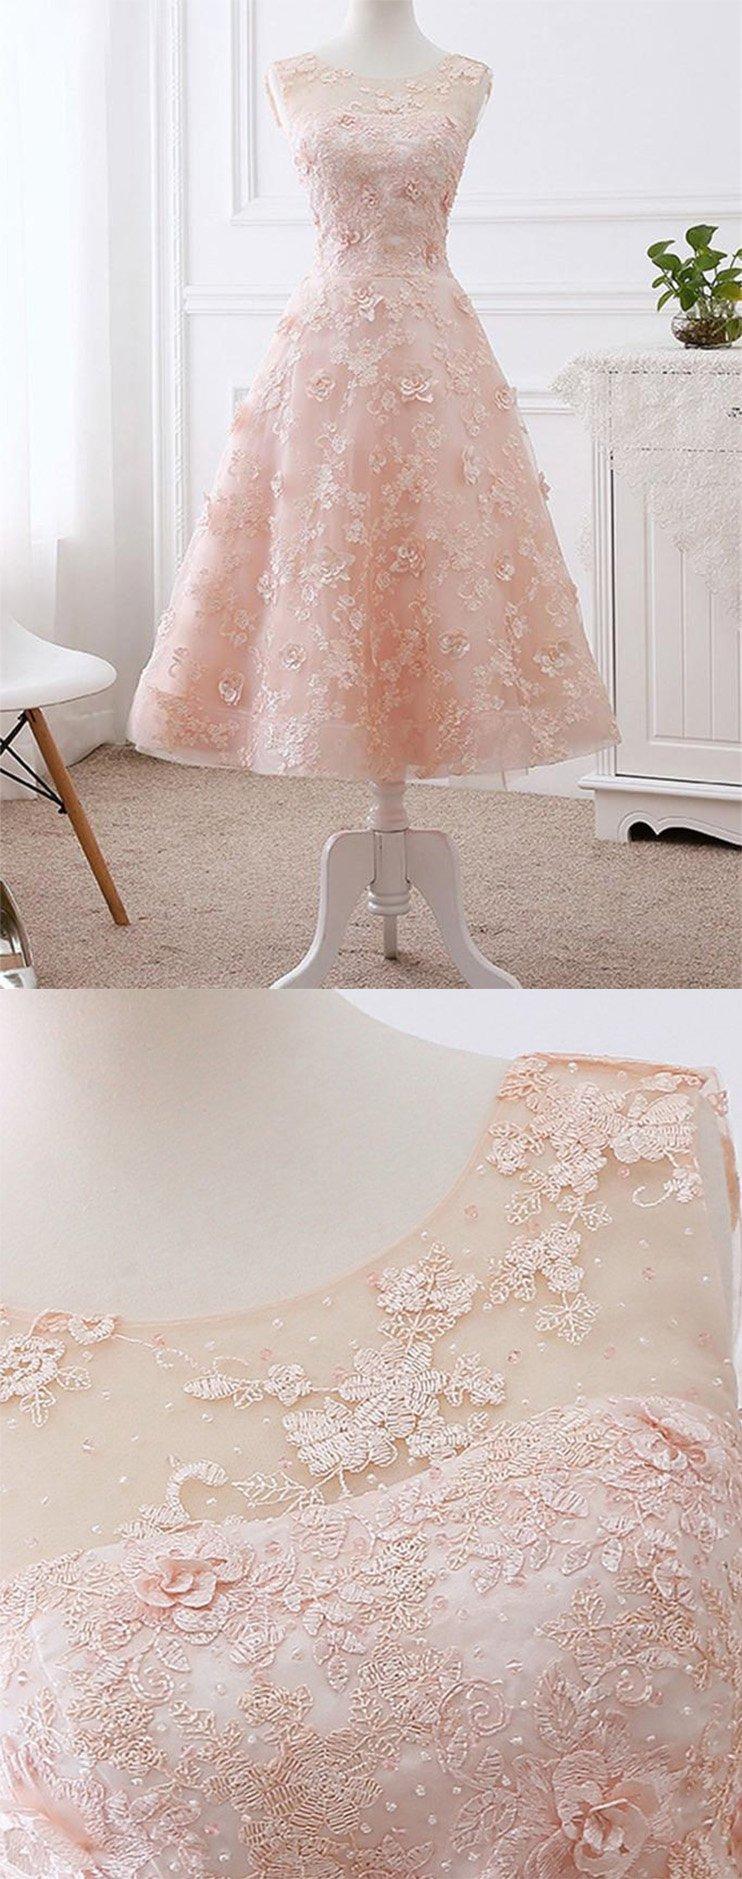 Elegant aline scoop neck tea length lace pink short prom dresses